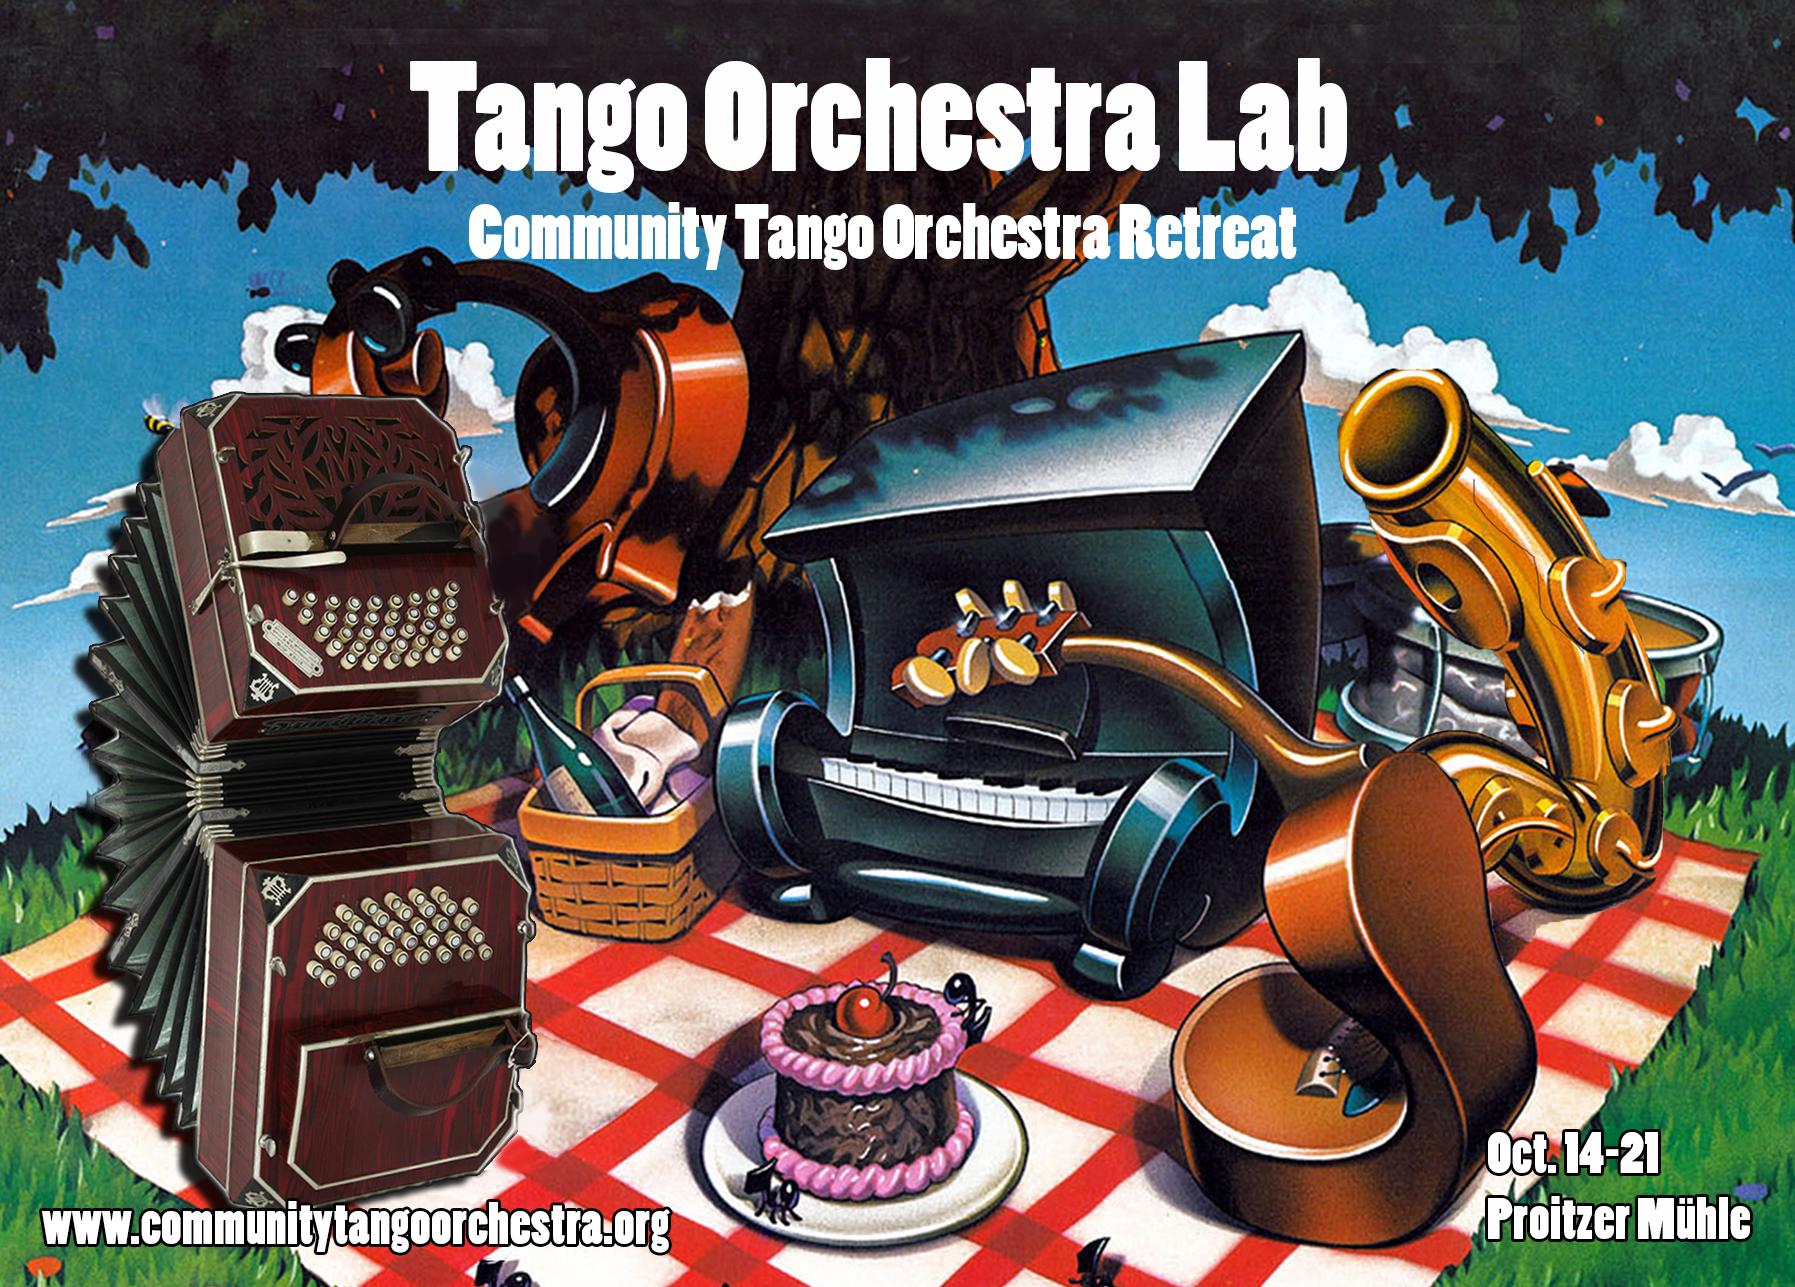 Tango Orchestra Lab (Community Tango Orchestra Retreat) Oct. 14-21